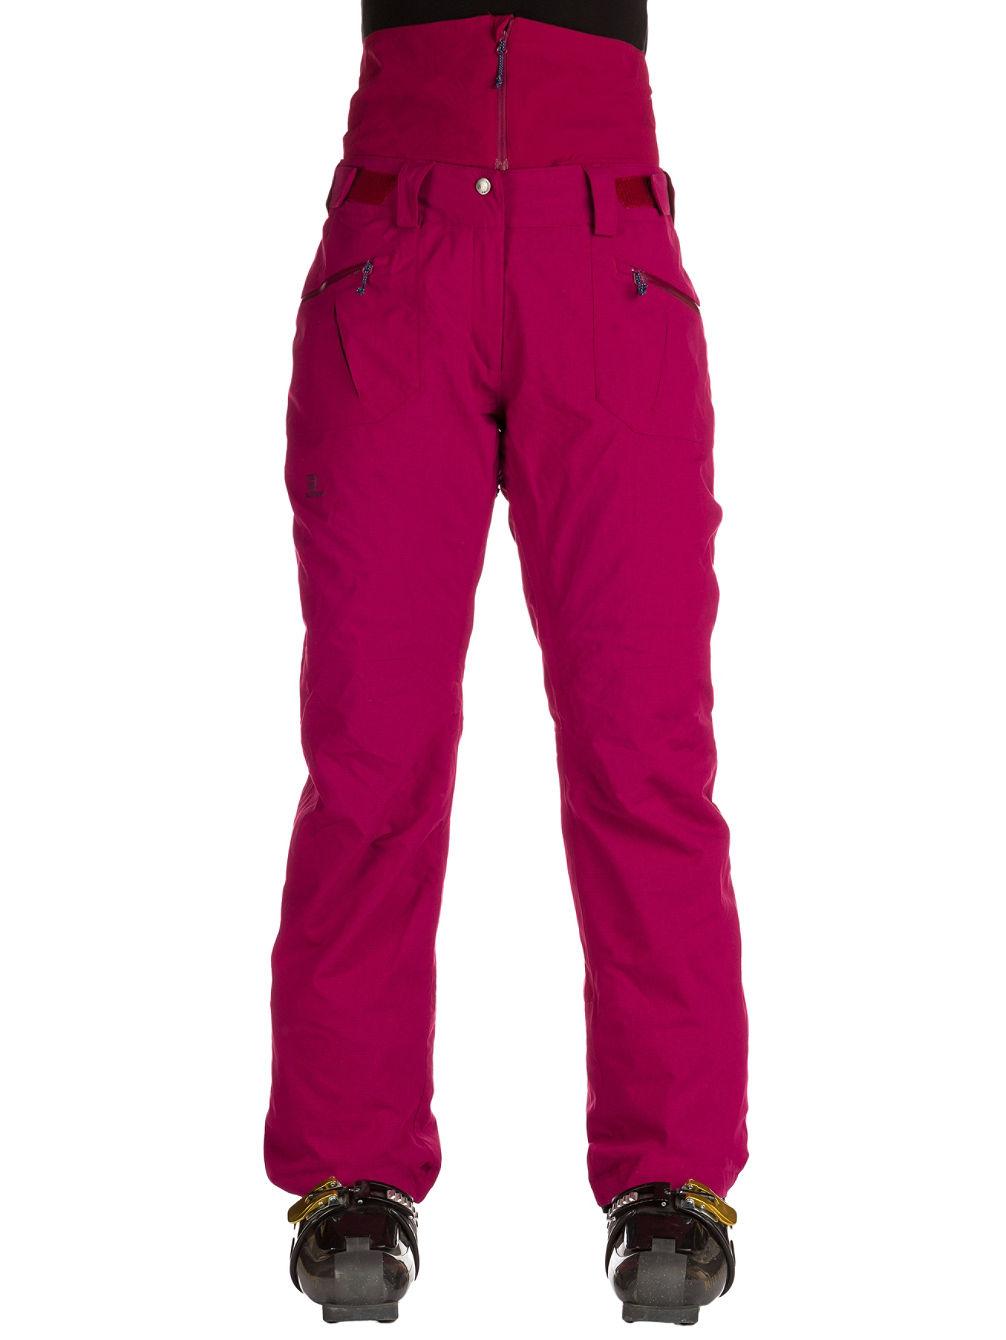 on sale 67b0d cefc5 Qst Snow Pants